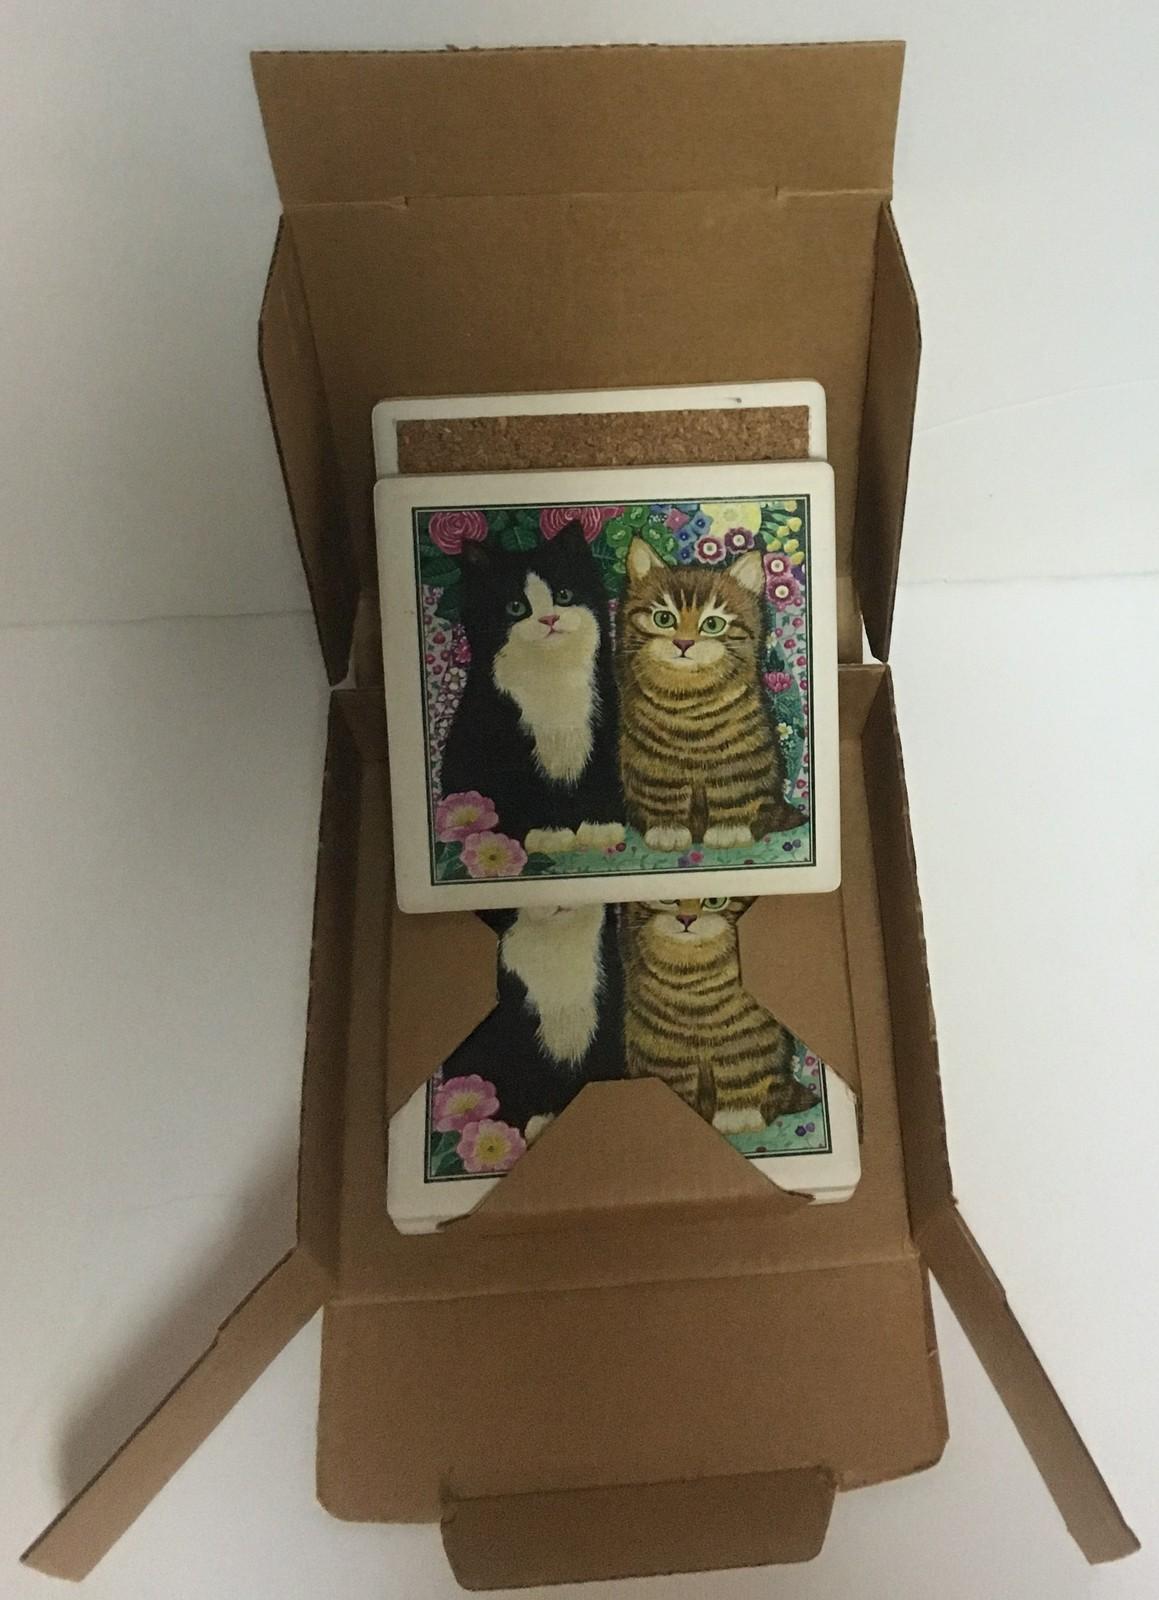 Absorbastone Cat Kittens & Flowers Coasters Set of 4 NIB